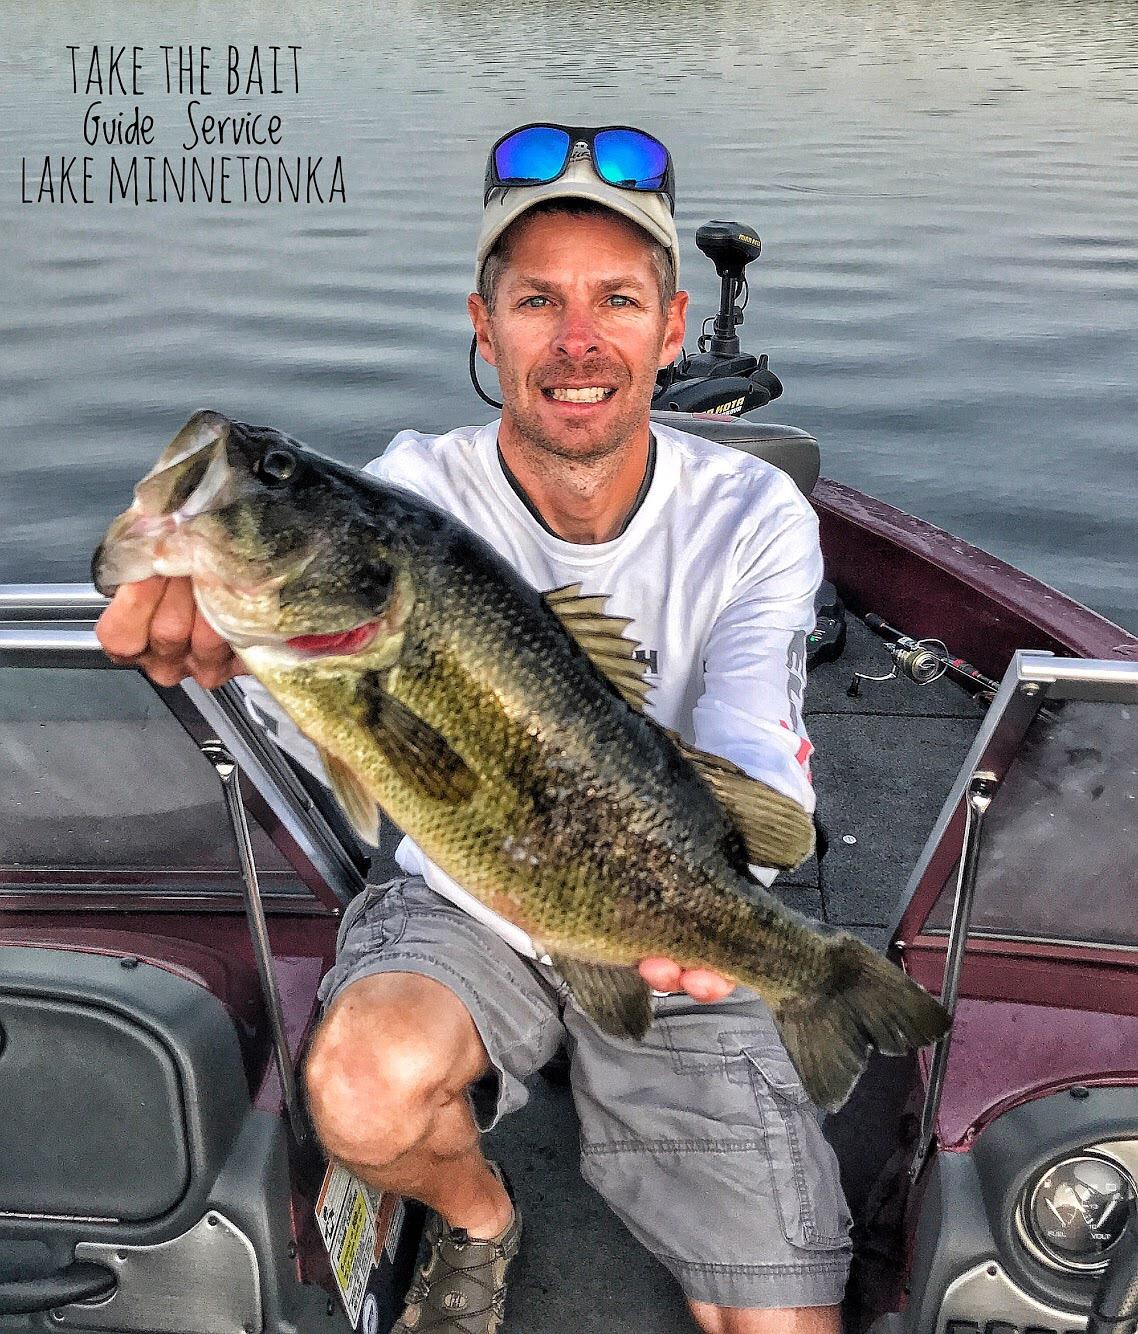 Take the bait guide service llc on lake minnetonka for Lake minnetonka fishing guide